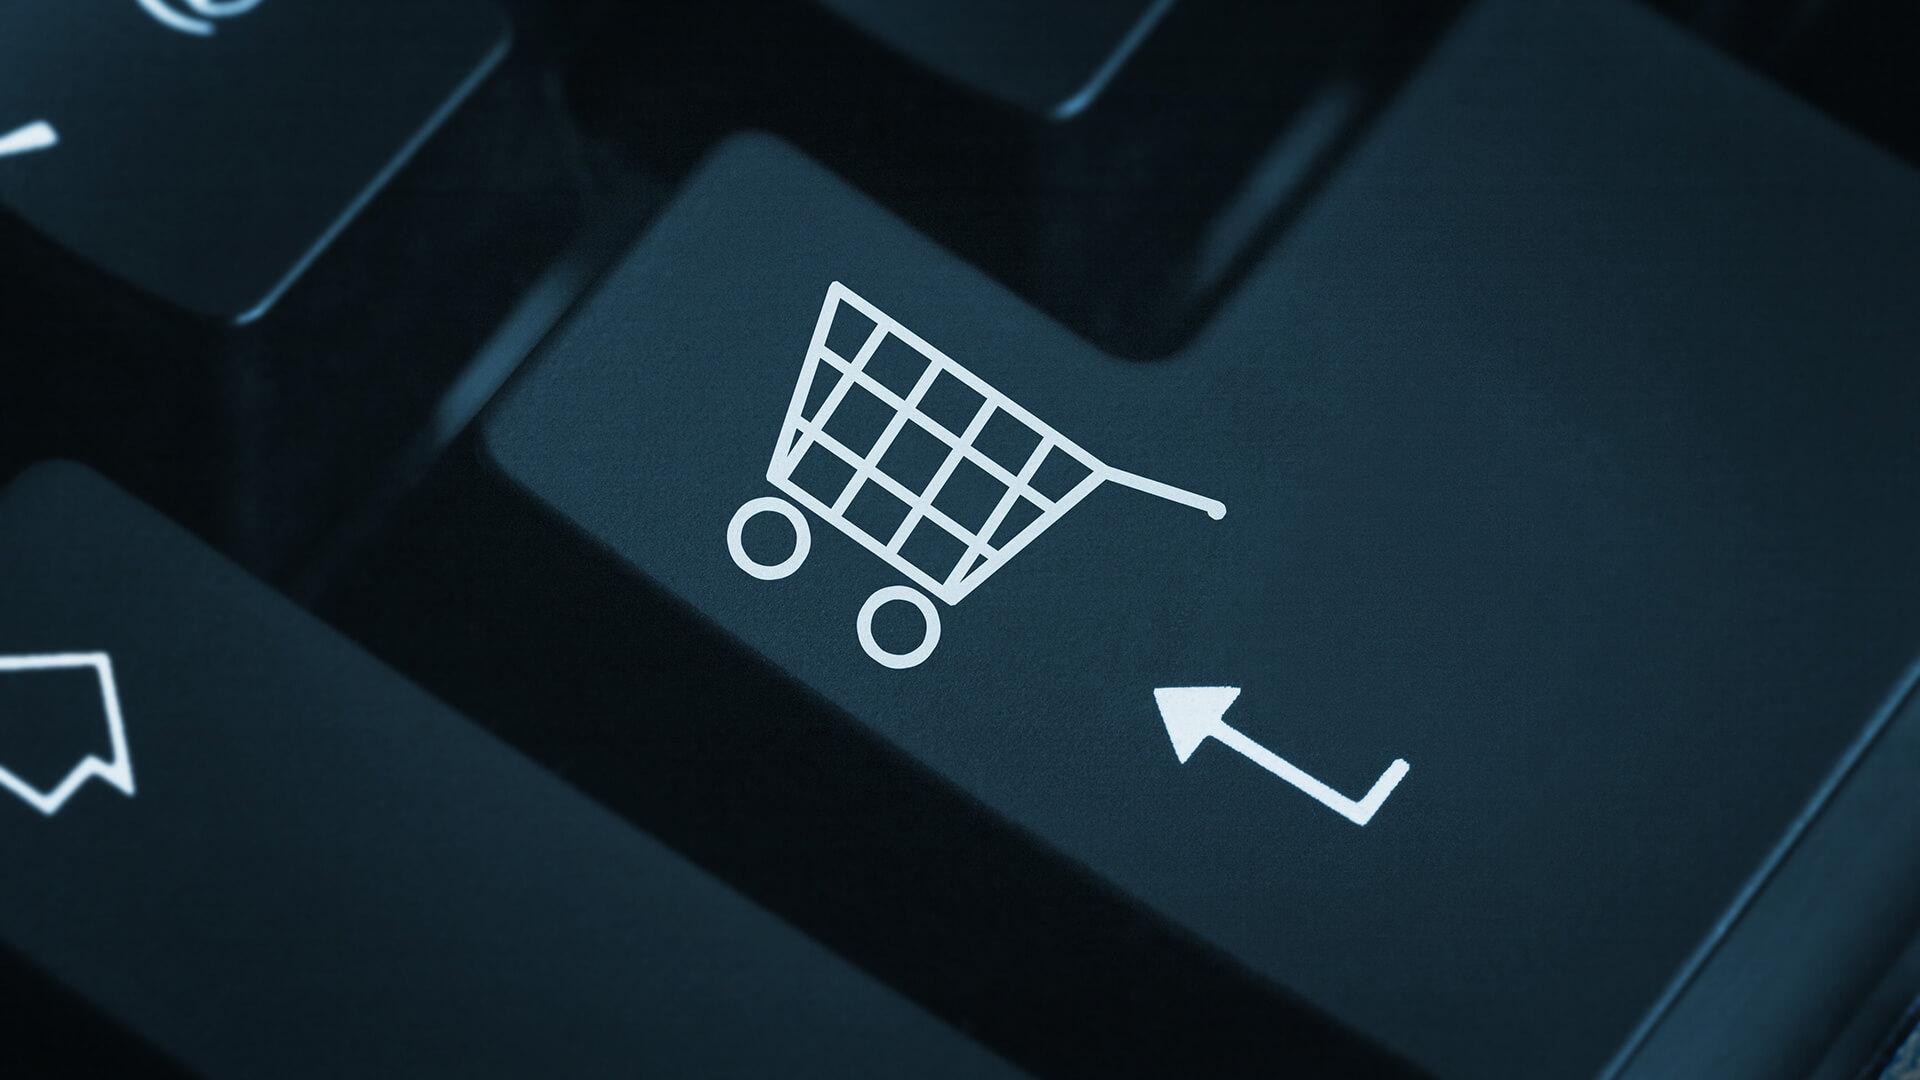 ecommerce-shopping-cart-keyboard-ss-1920.jpg